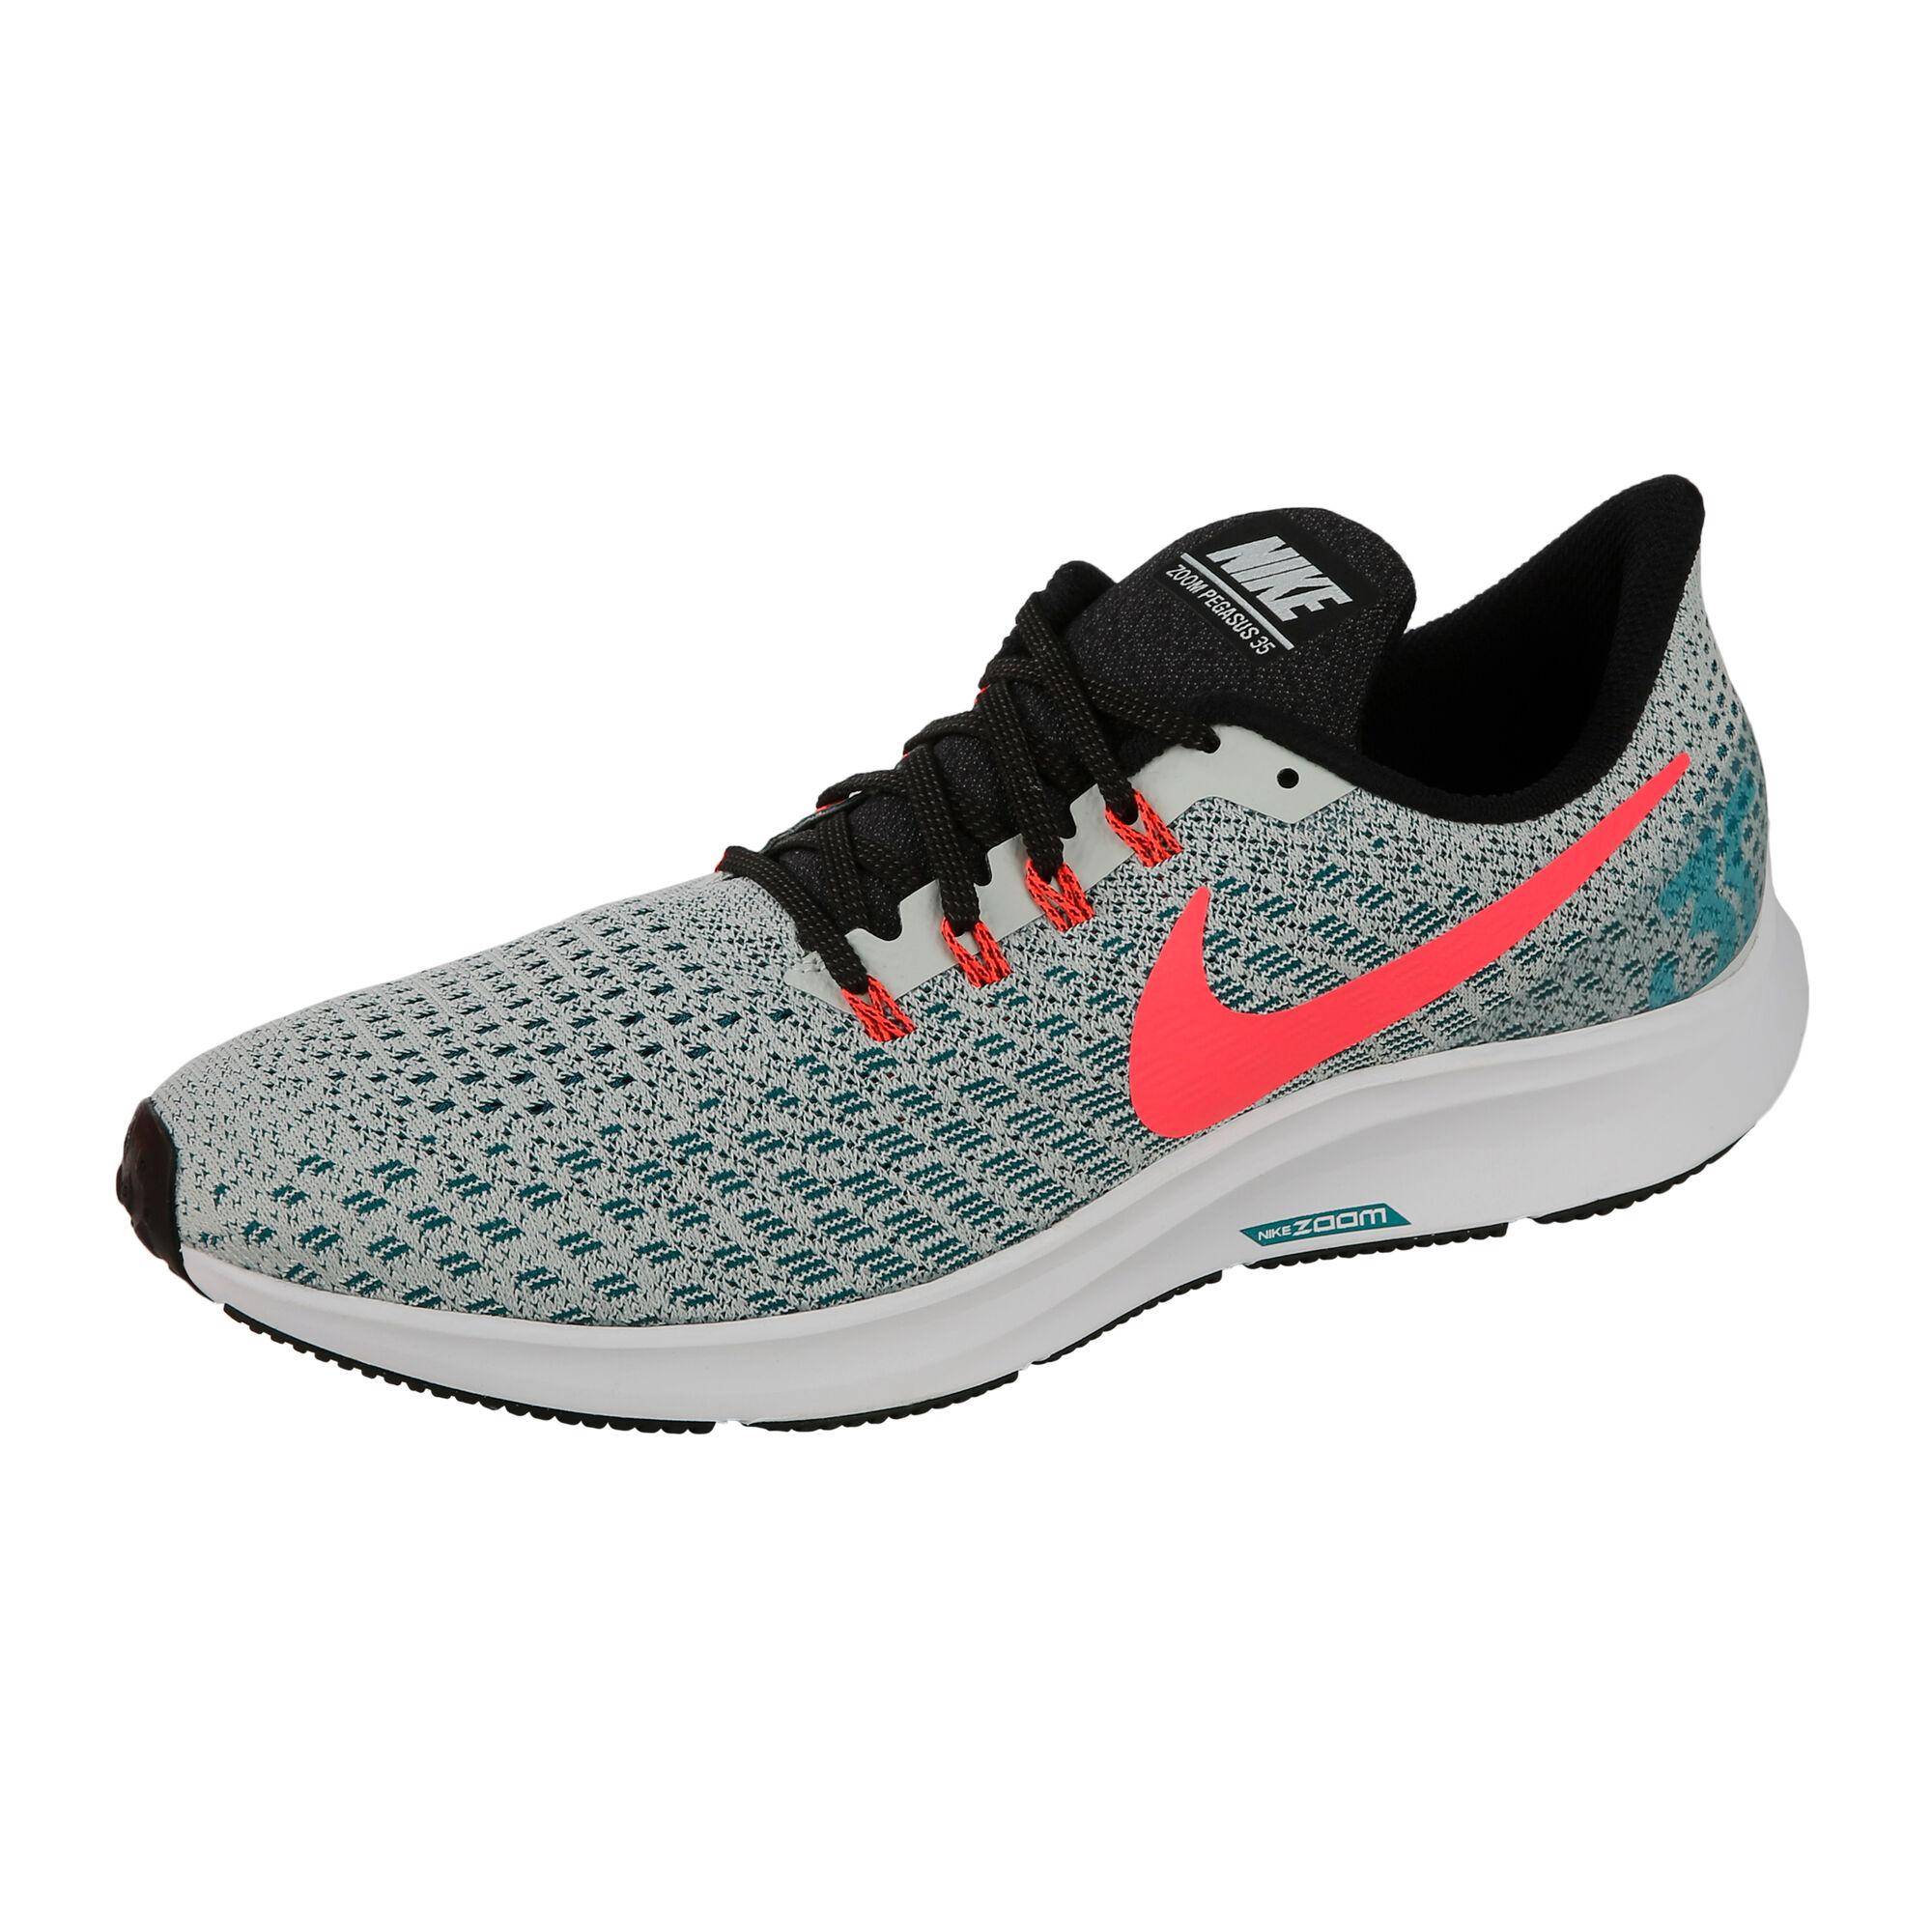 first rate b8a8c 41603 Nike · Nike · Nike · Nike · Nike. Air Zoom Pegasus 35 ...